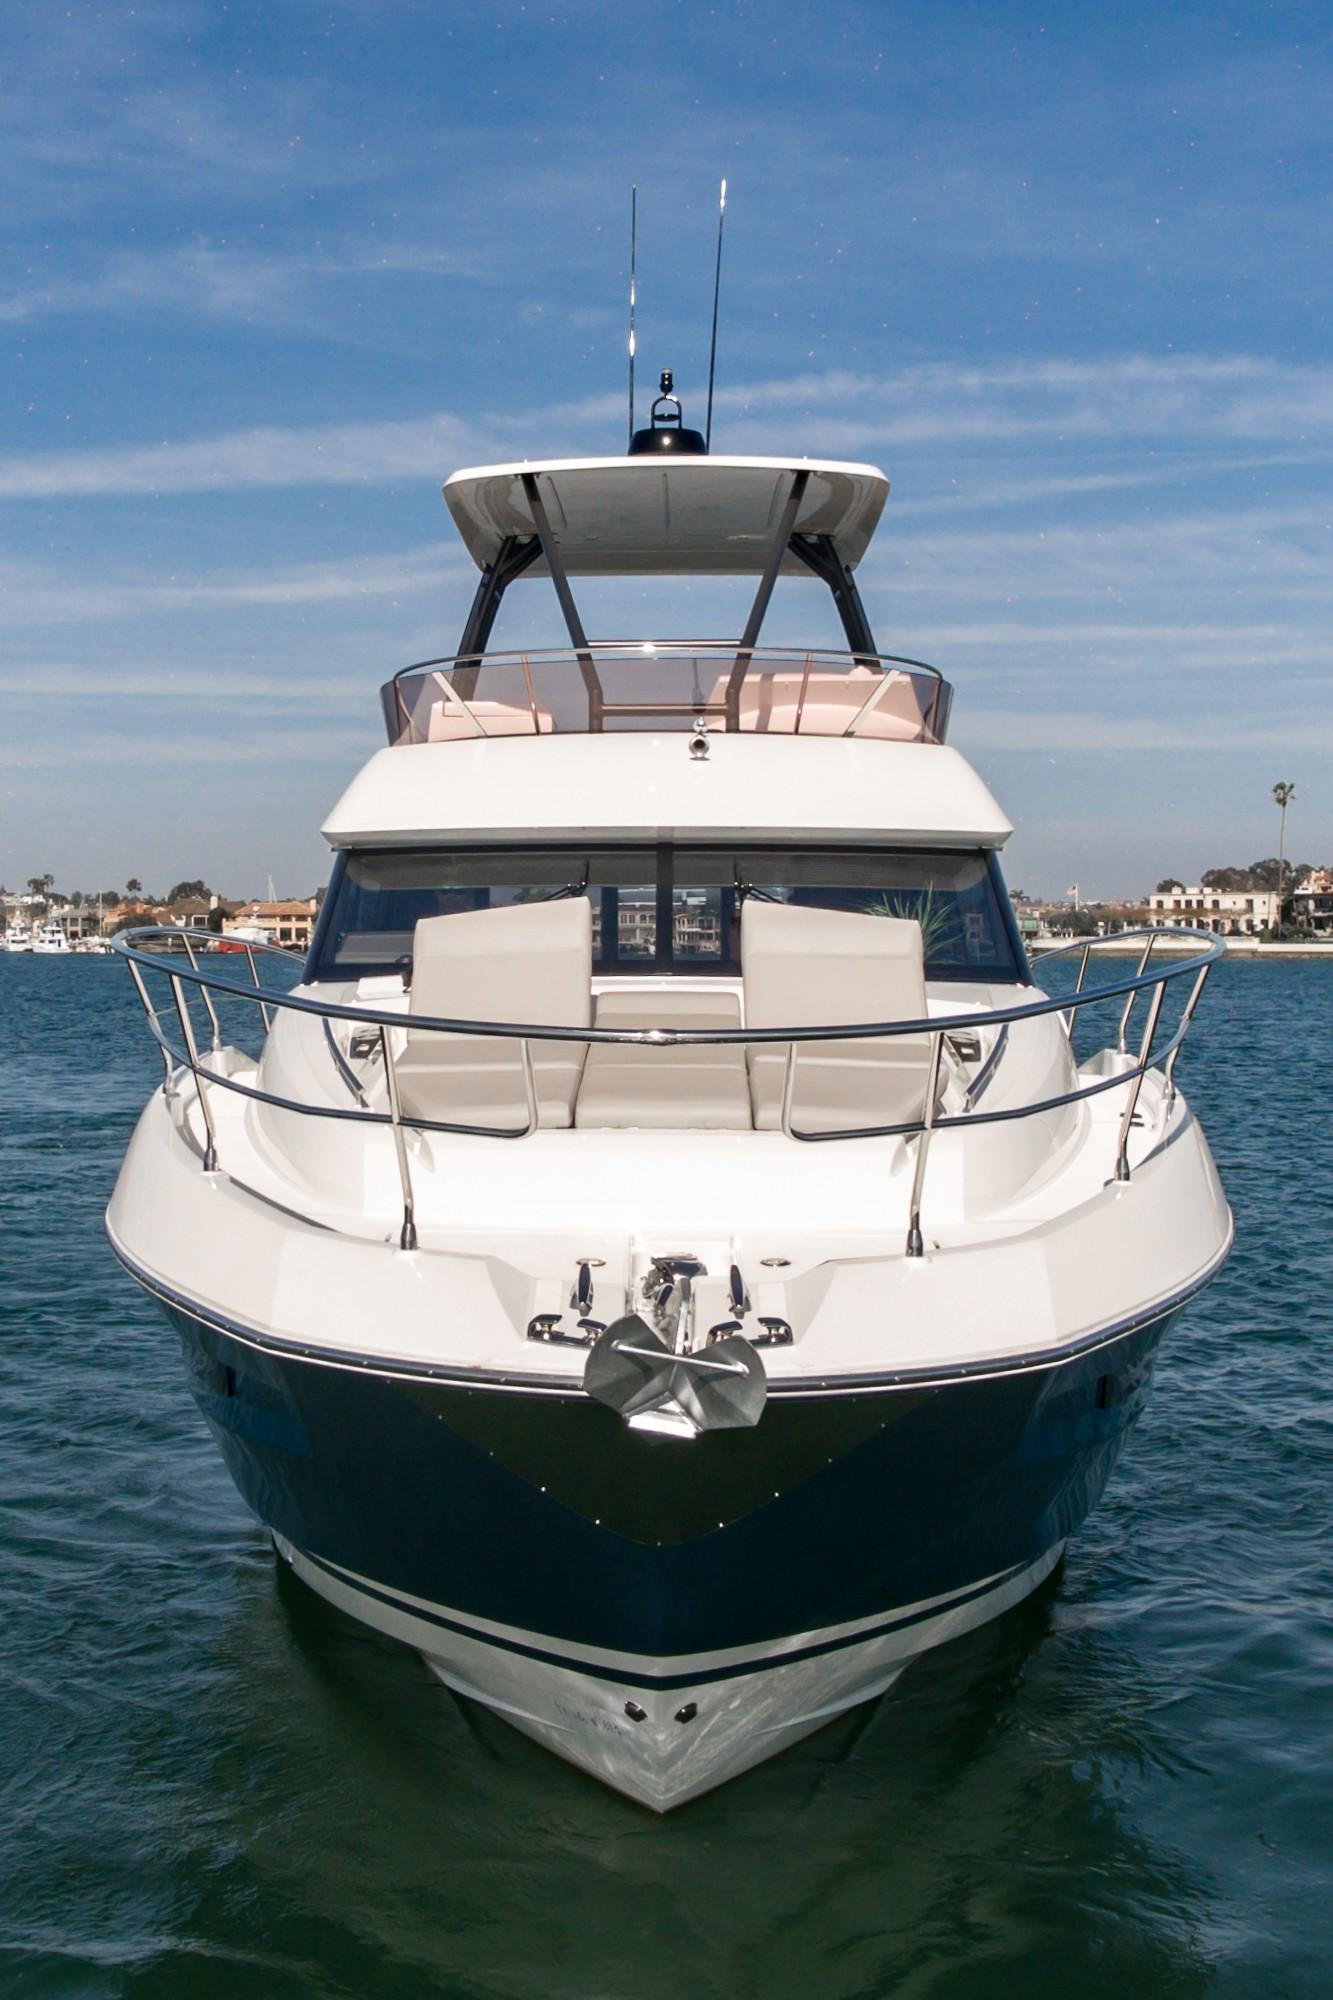 2020 Prestige 460 Fly #PR127L inventory image at Sun Country Coastal in Newport Beach